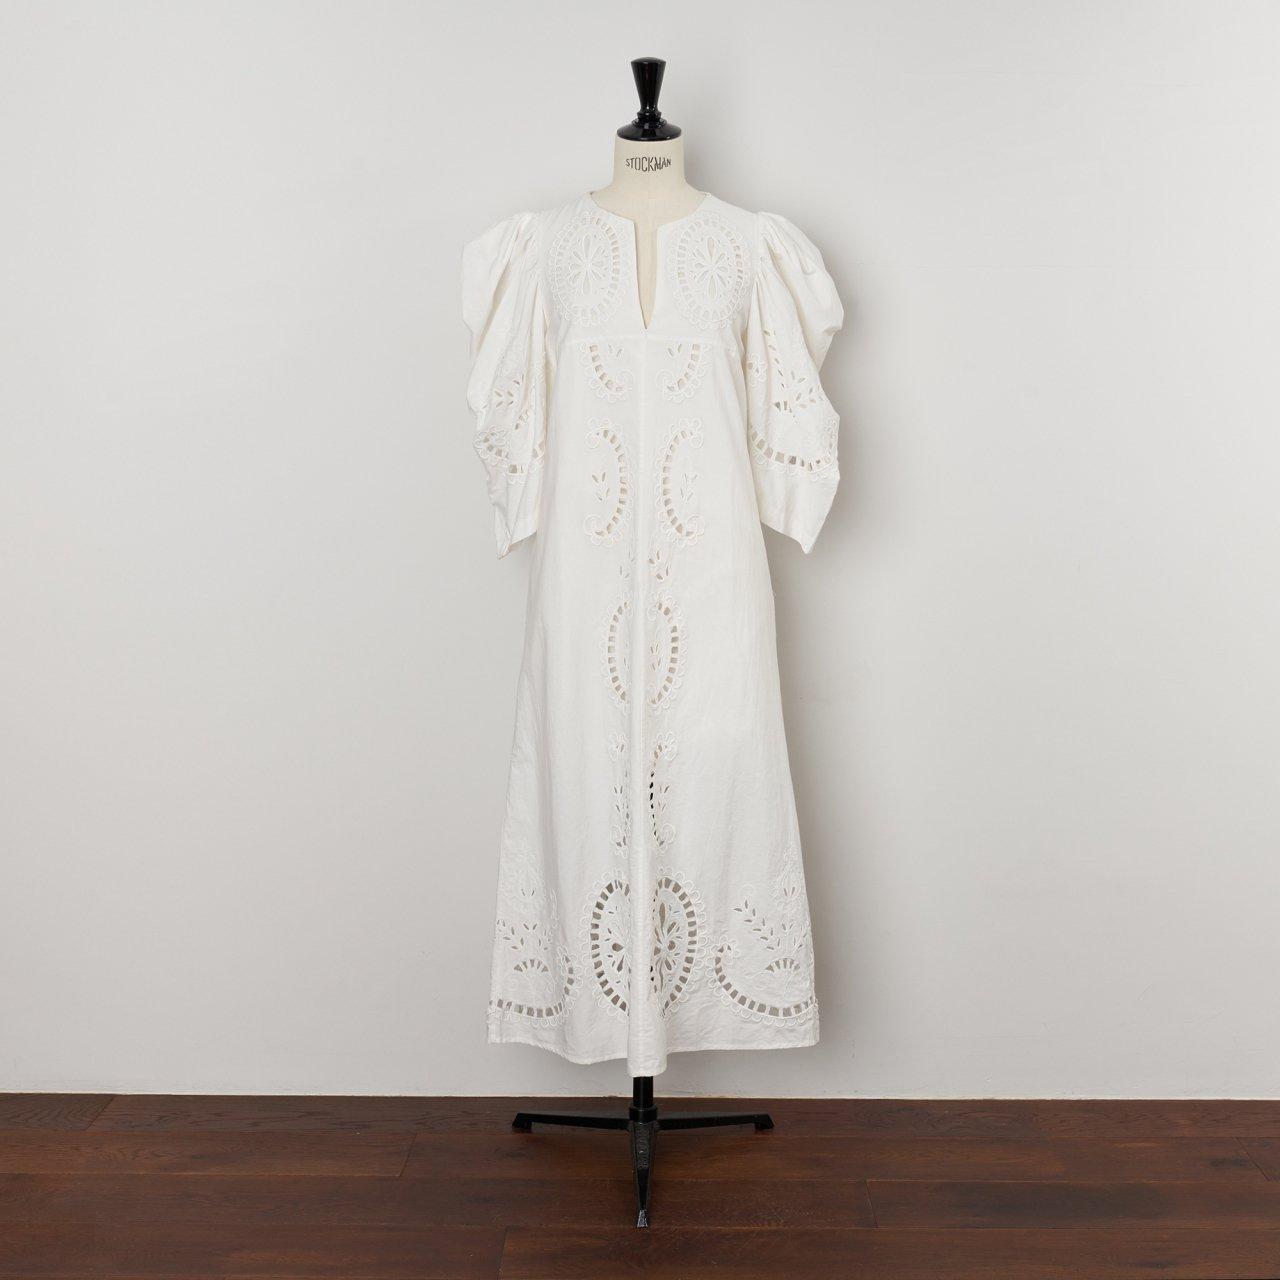 Sea New York<BR>S/S DRESS<BR>WHITE